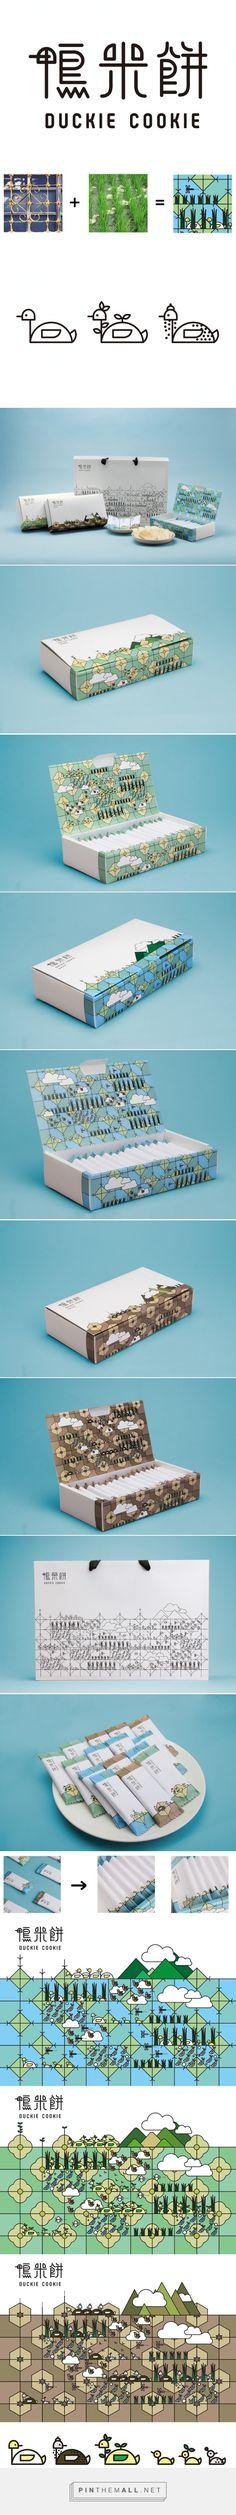 Duckie #Cookie #packaging designed by Yu-Heng Lin - http://www.packagingoftheworld.com/2015/06/duckie-cookie.html